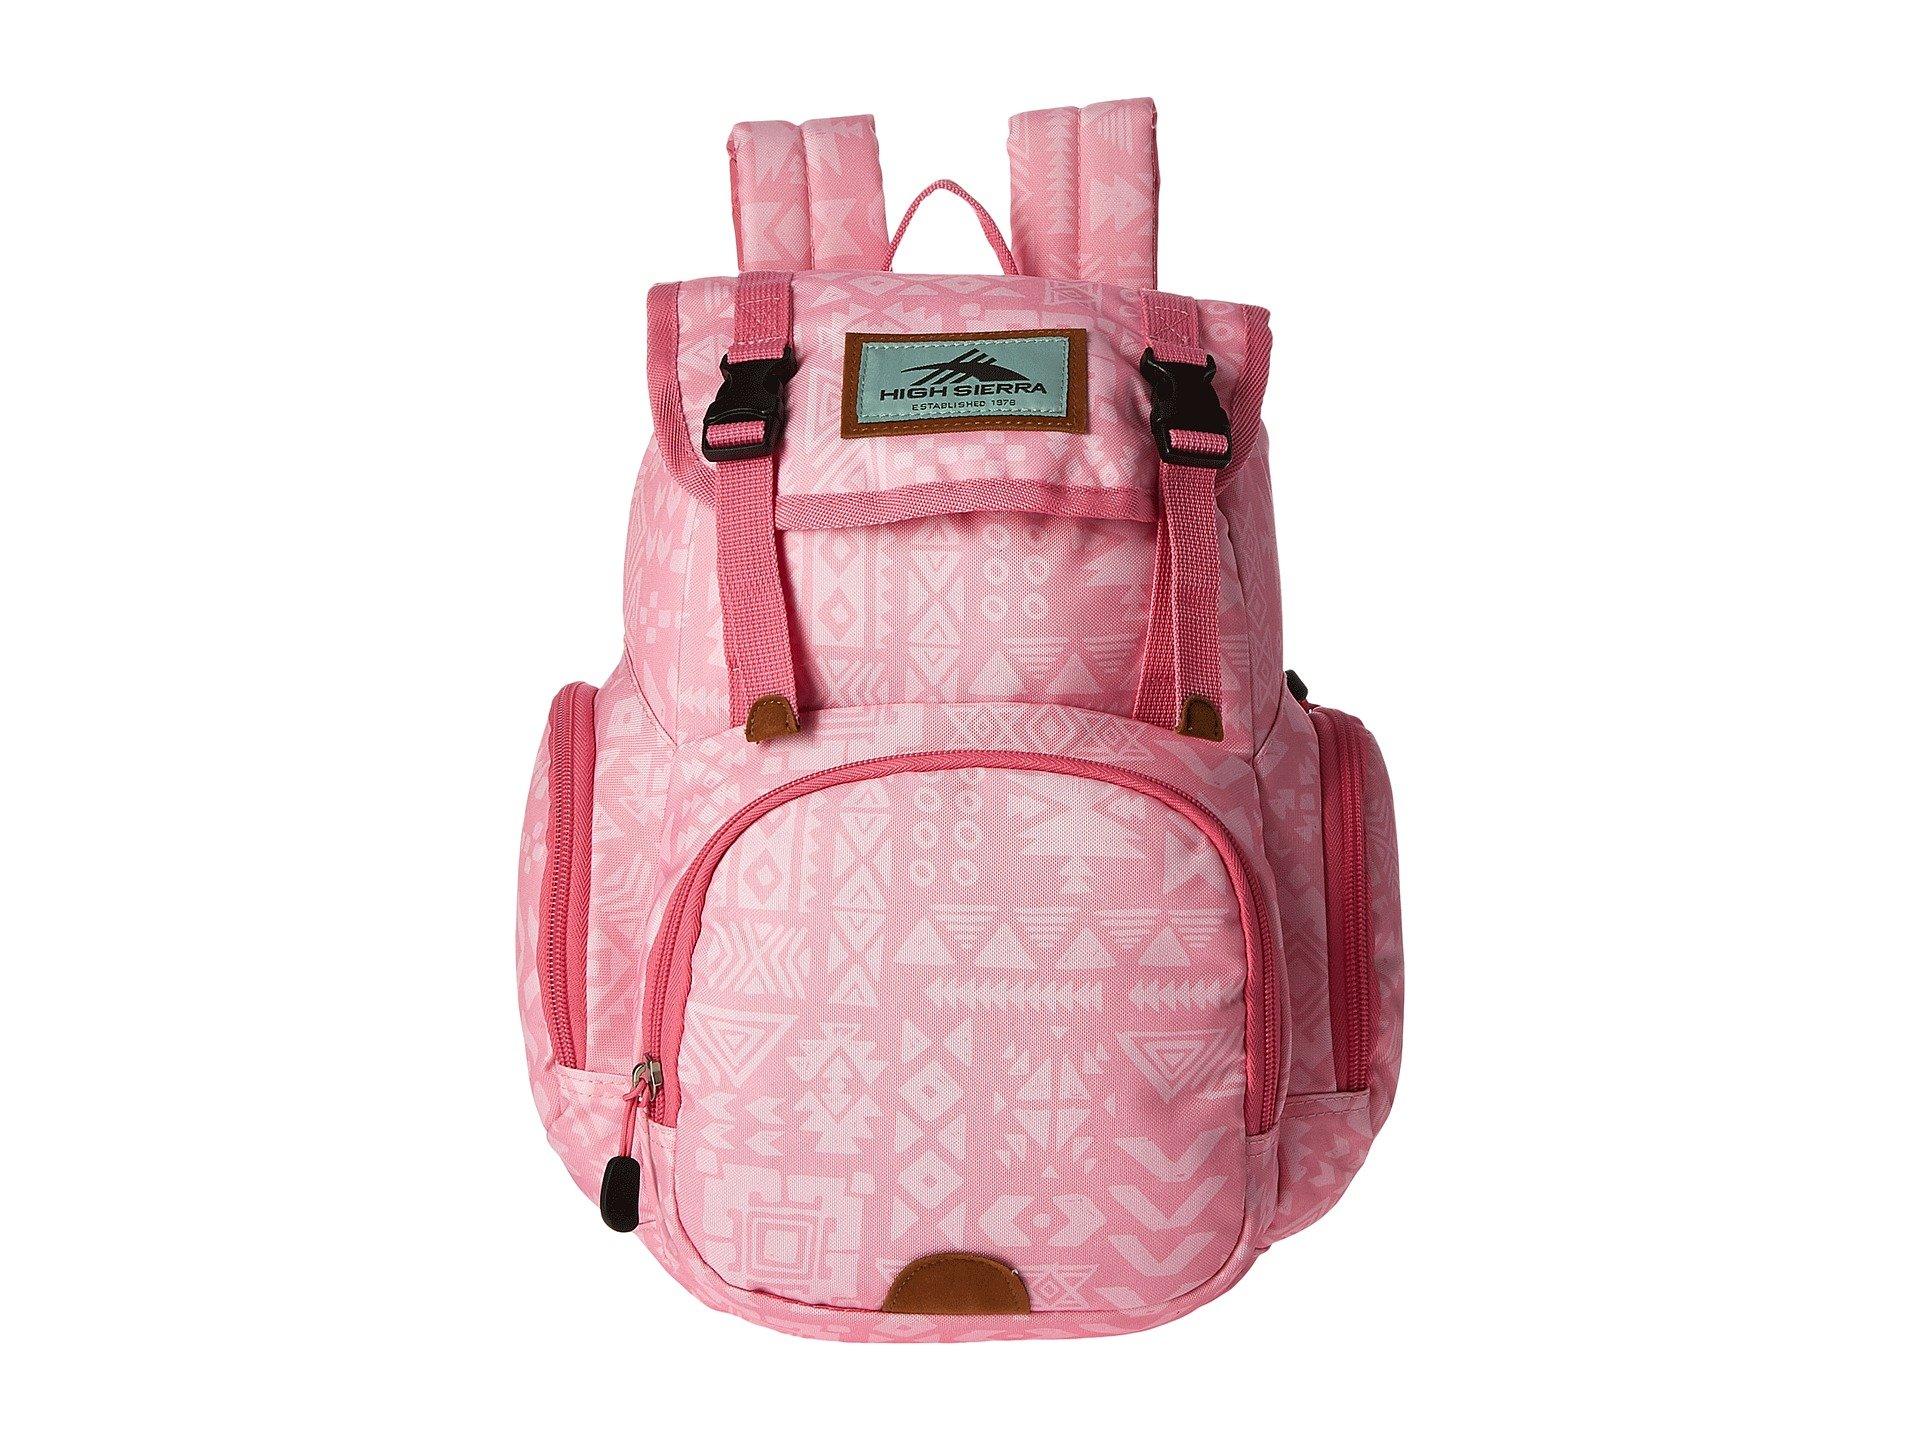 bfeaac32066 High Sierra Mini Emmett Backpack- Fenix Toulouse Handball